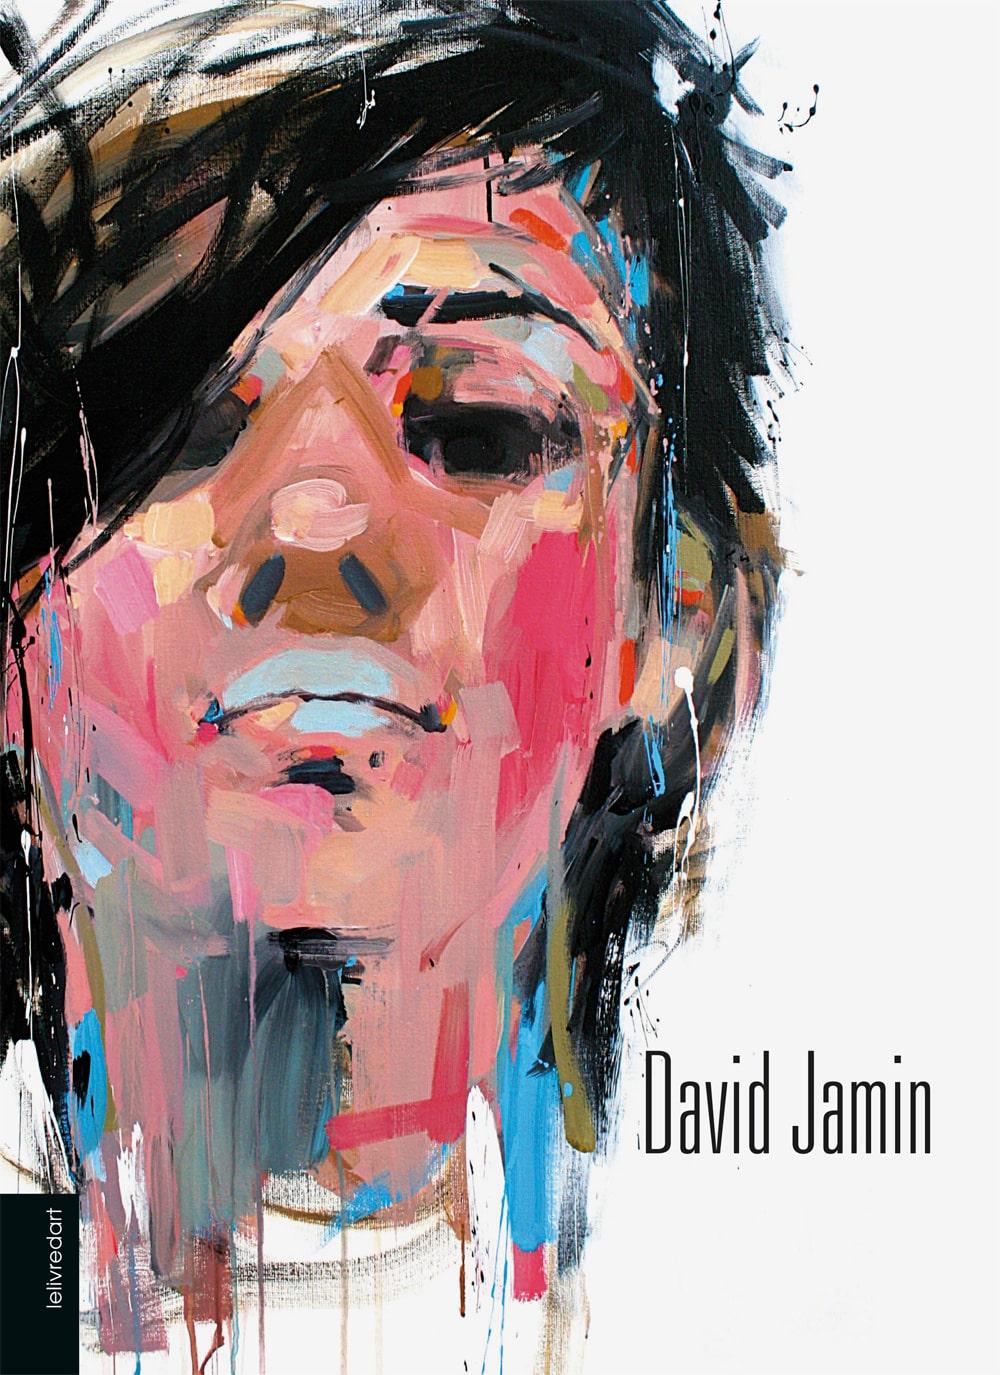 David Jamin